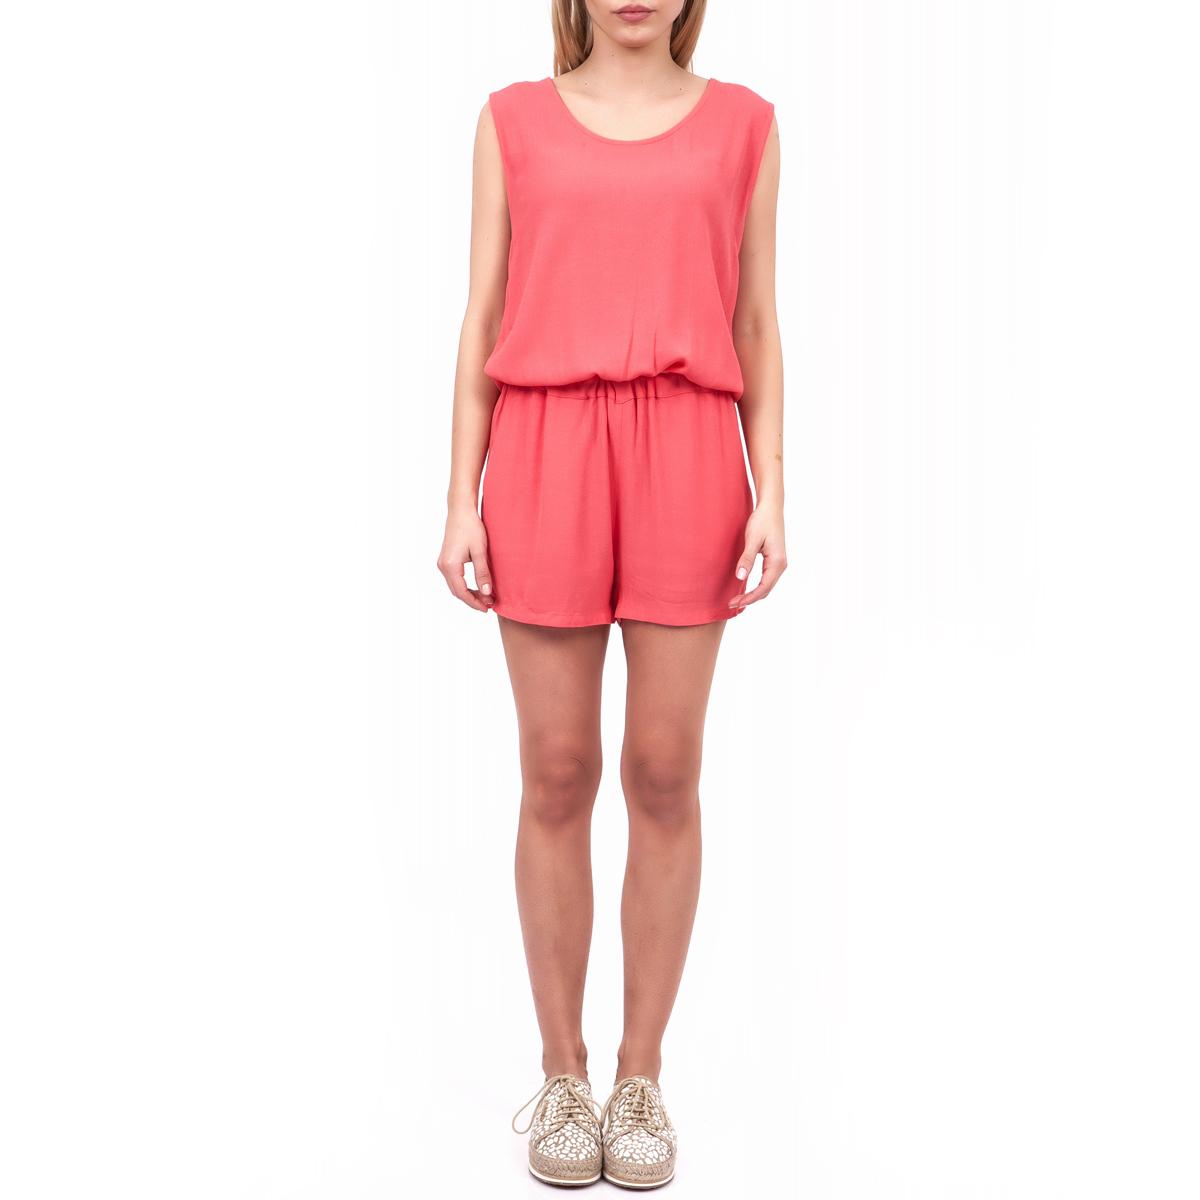 AMERICAN VINTAGE - Γυναικεία ολόσωμη φόρμα American Vintage ροζ γυναικεία ρούχα ολόσωμες φόρμες